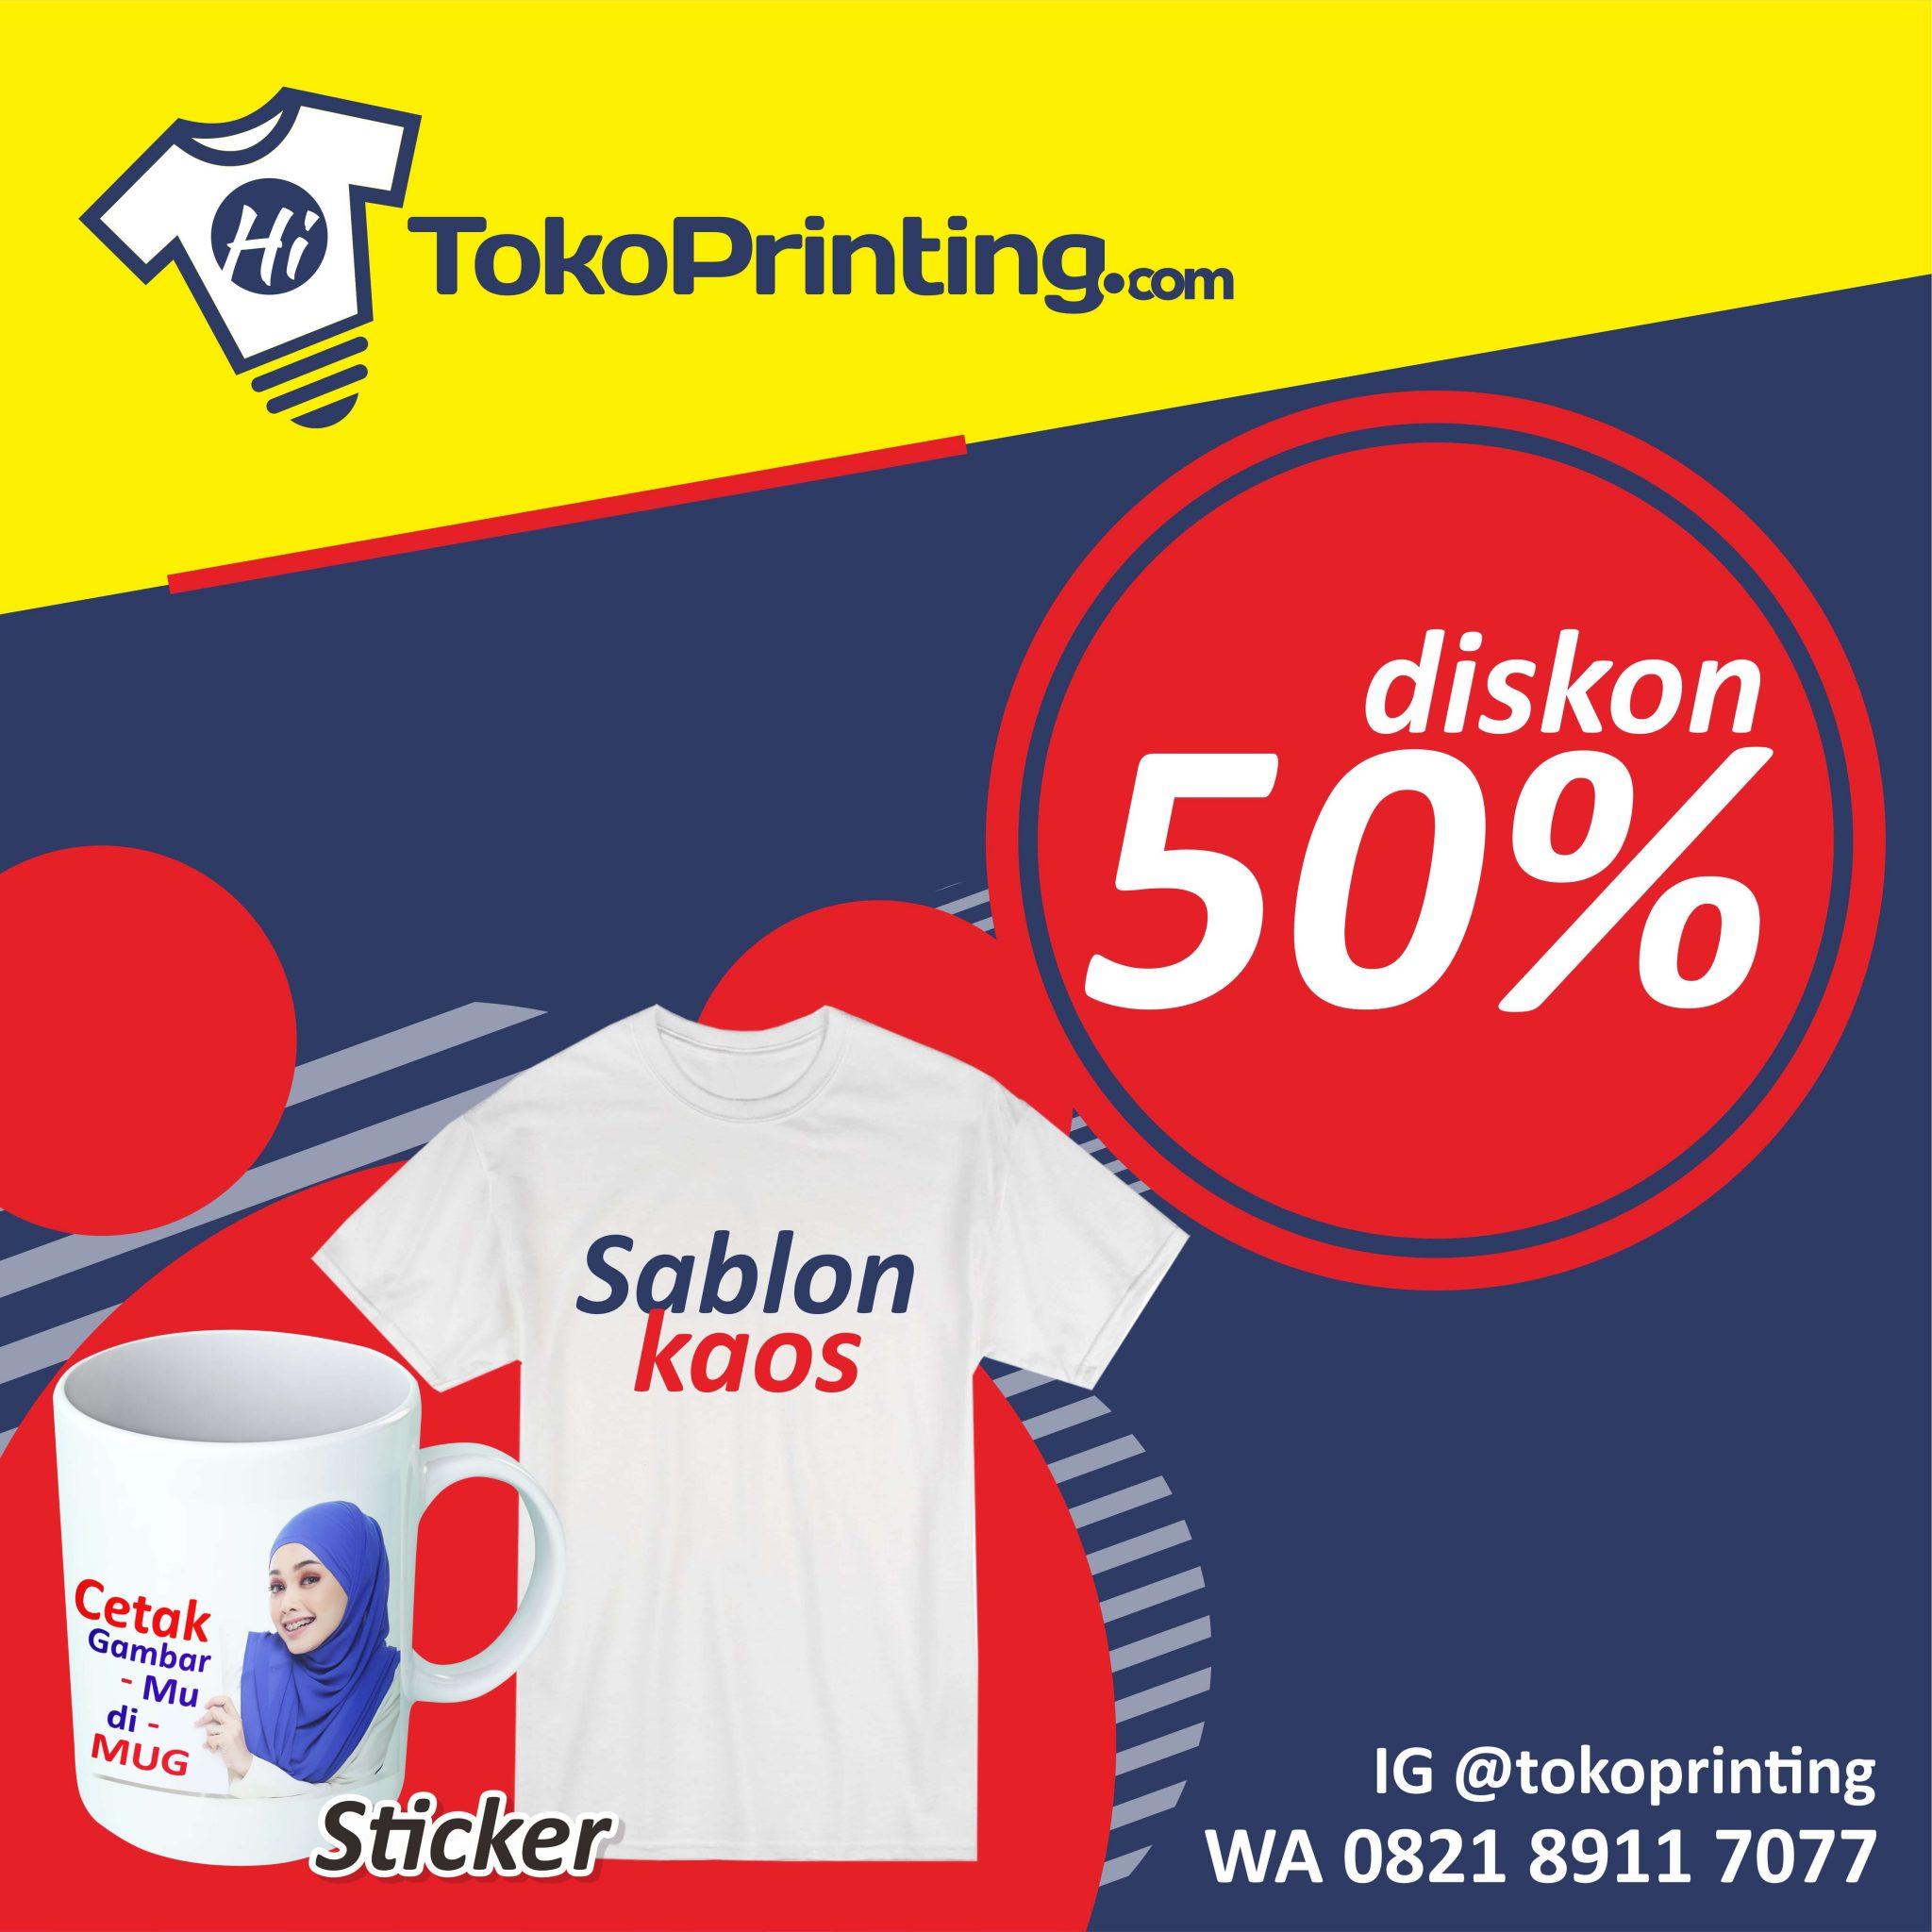 Percetakan Makassar - PROMO!!! HP/WA 0821 8911 7077 - Toko ...